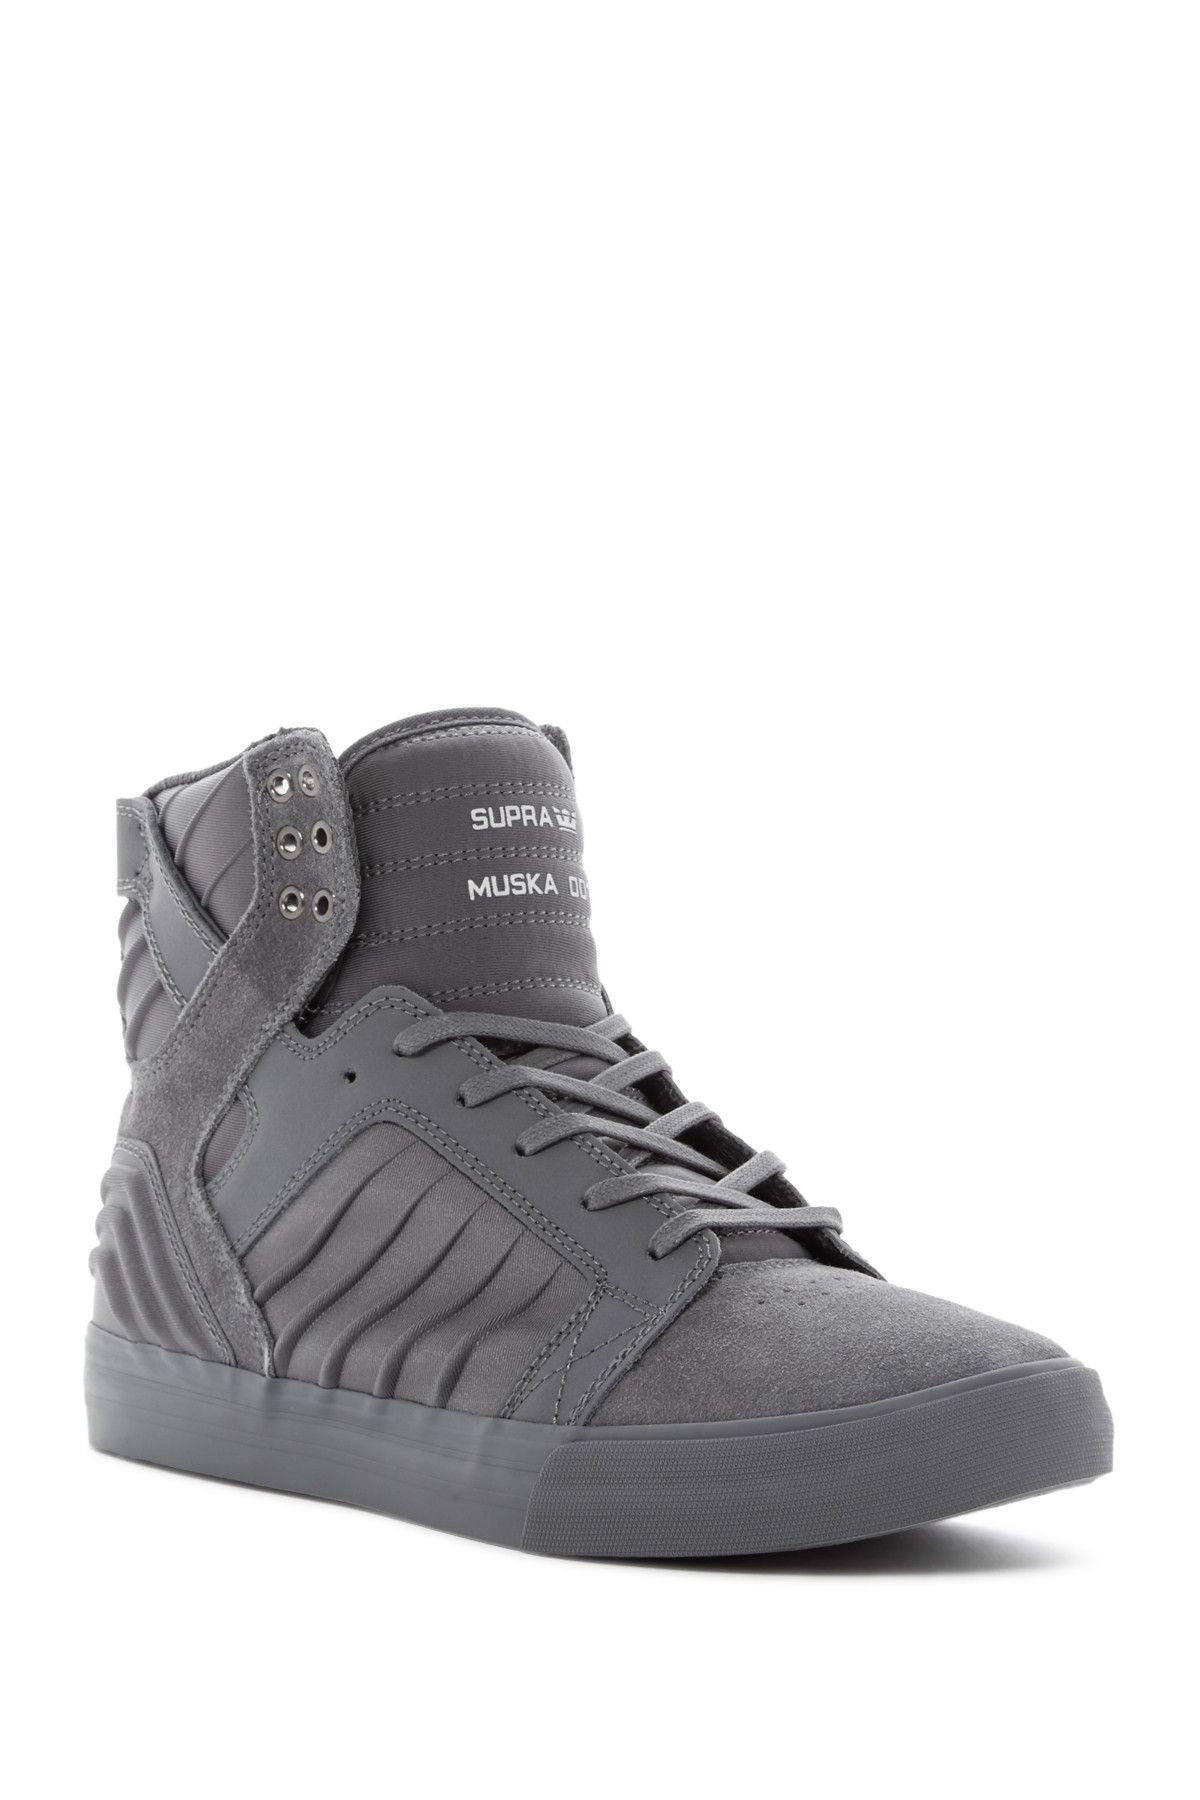 8f662c5652b1 Supra Skytop Evo High Top Sneaker